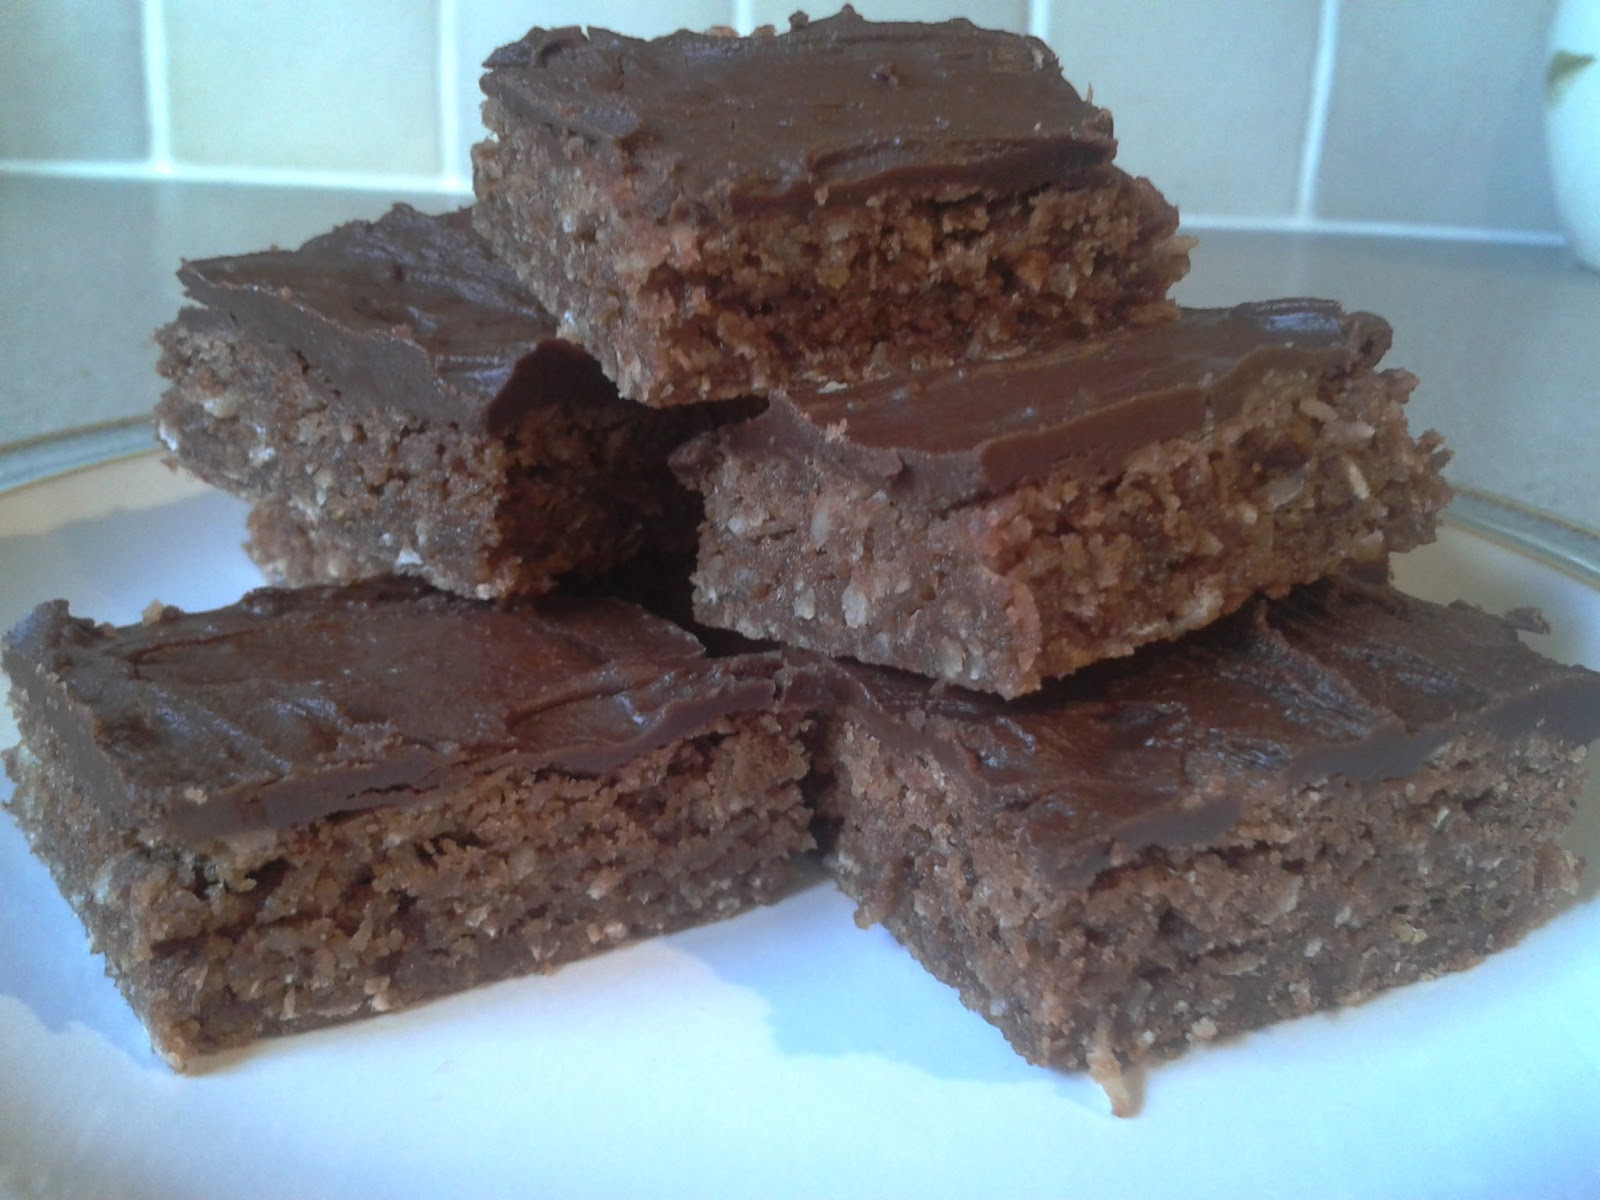 Claire's Chocolate Heaven: Chocolate Weetabix Traybake